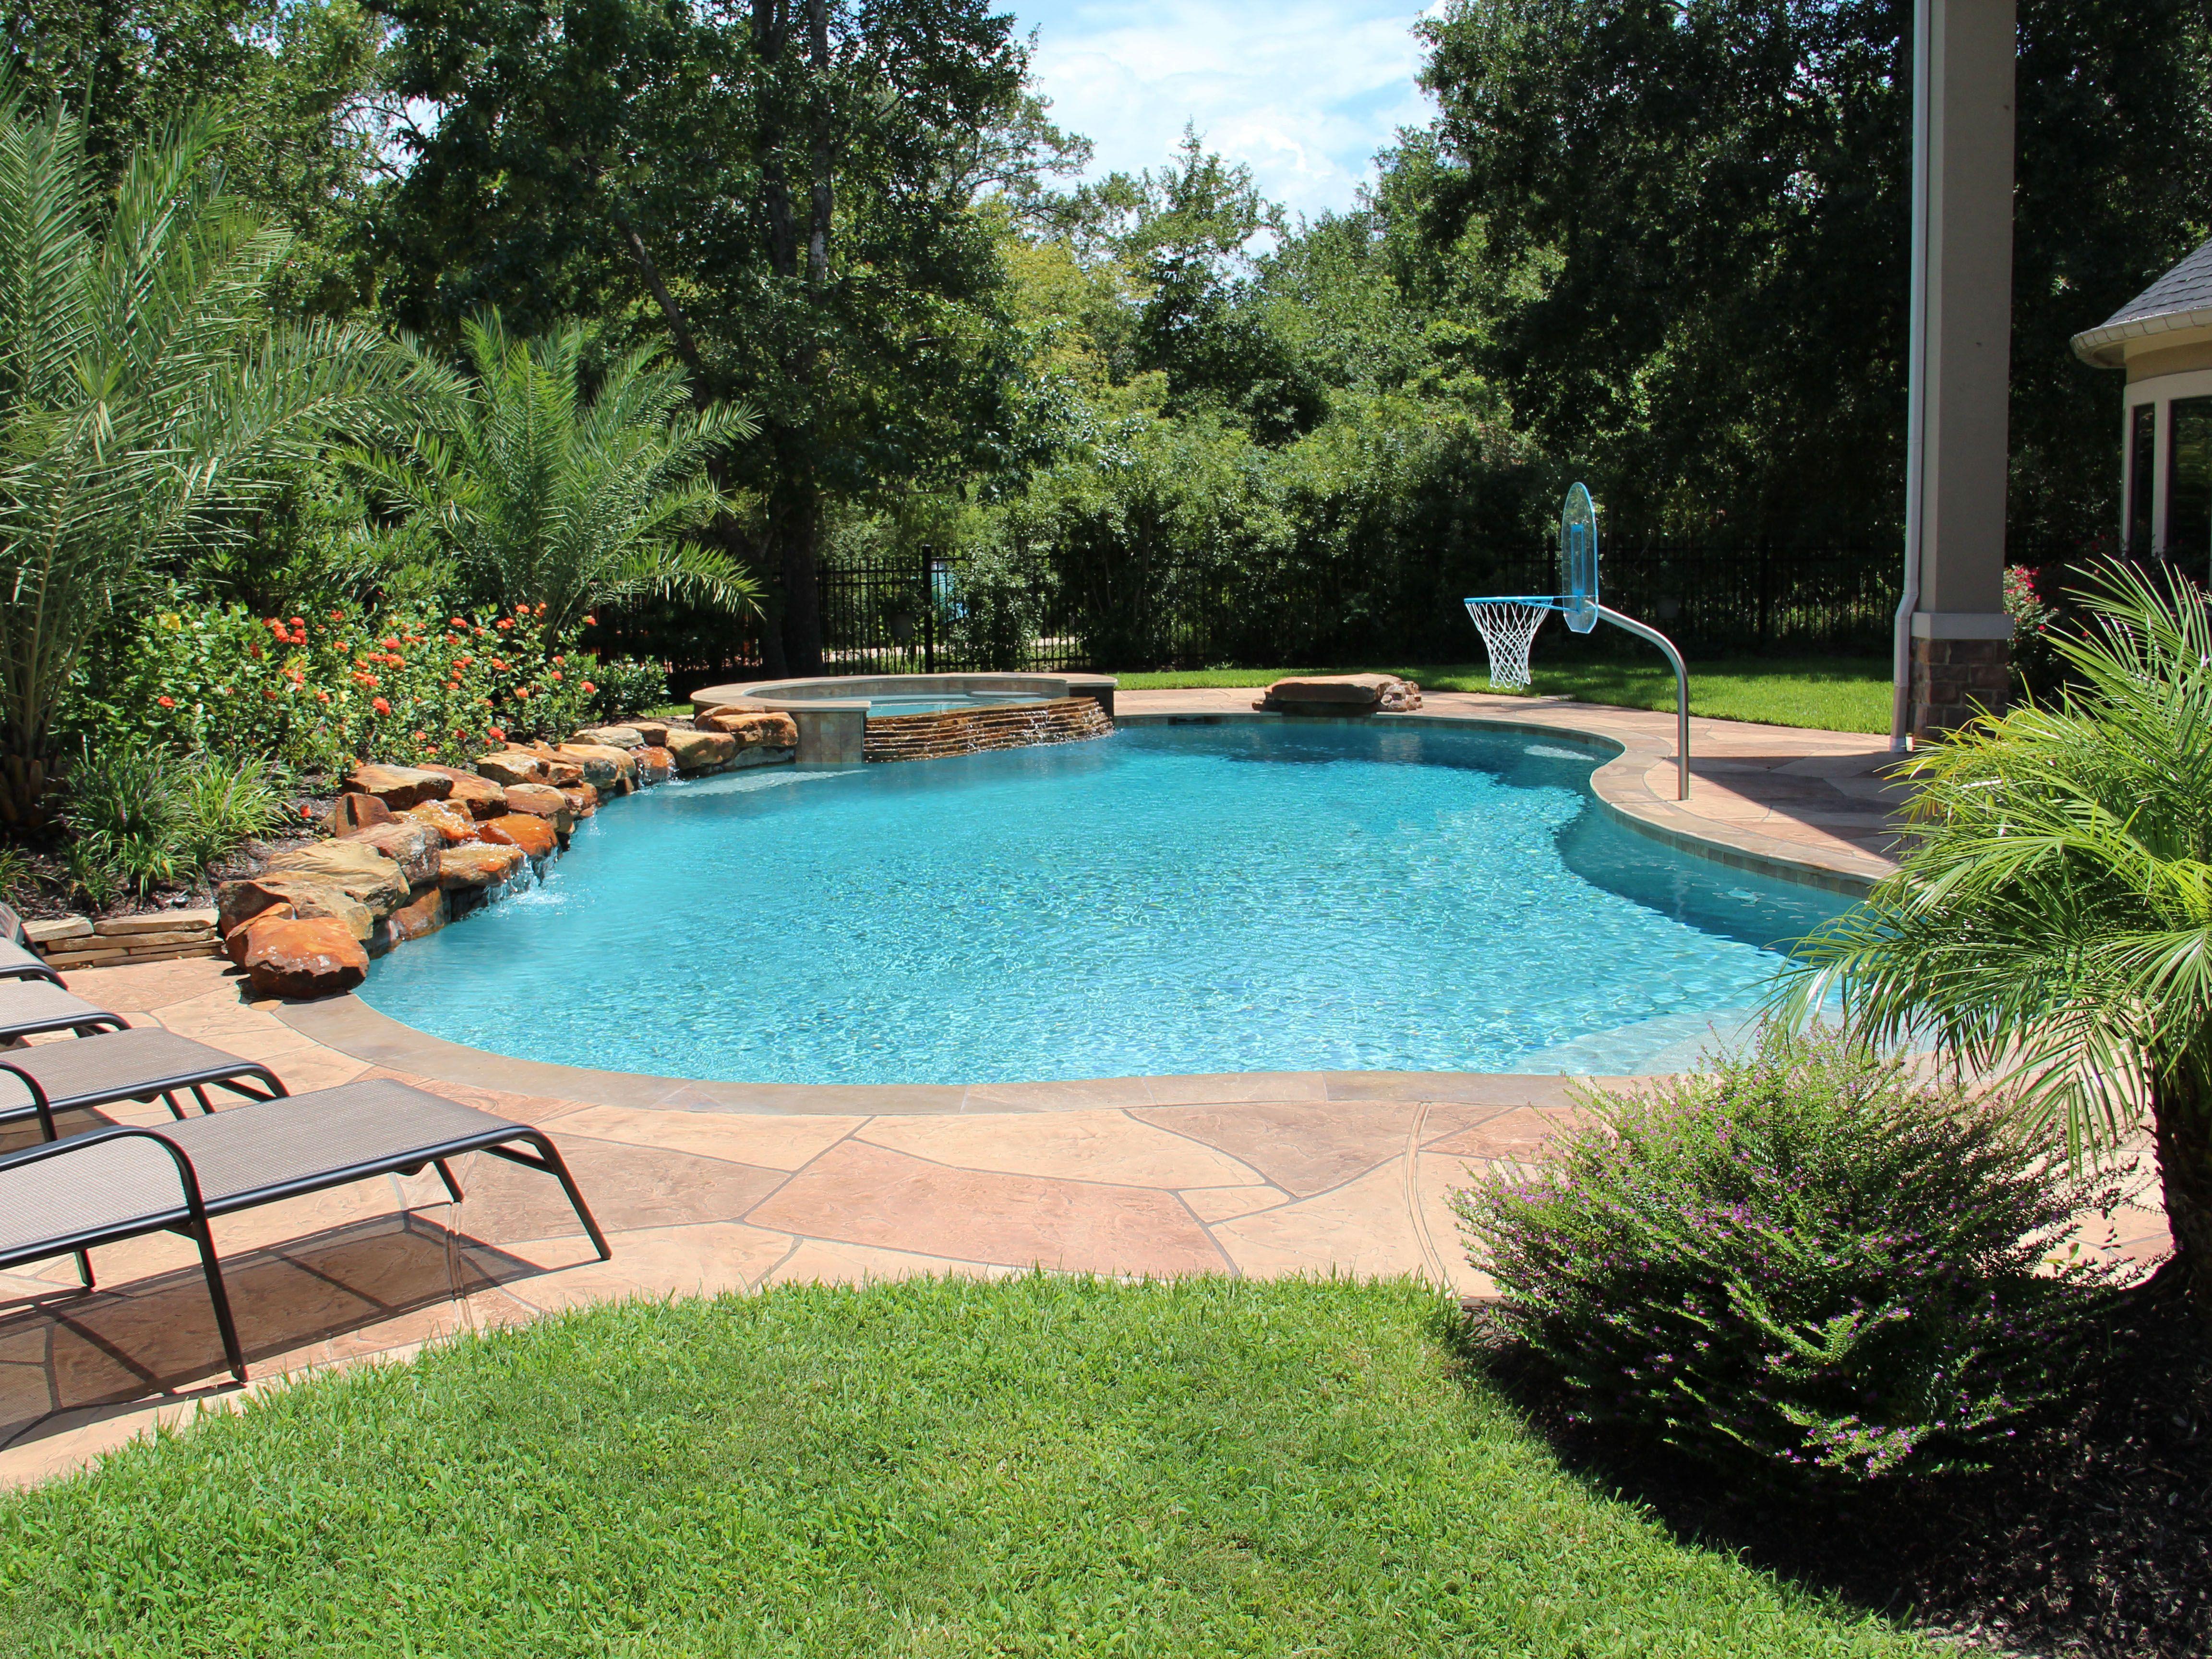 Free Form Swimming Pool Designs Natural Free Form Swimming Pools Design 242  Custom Outdoors